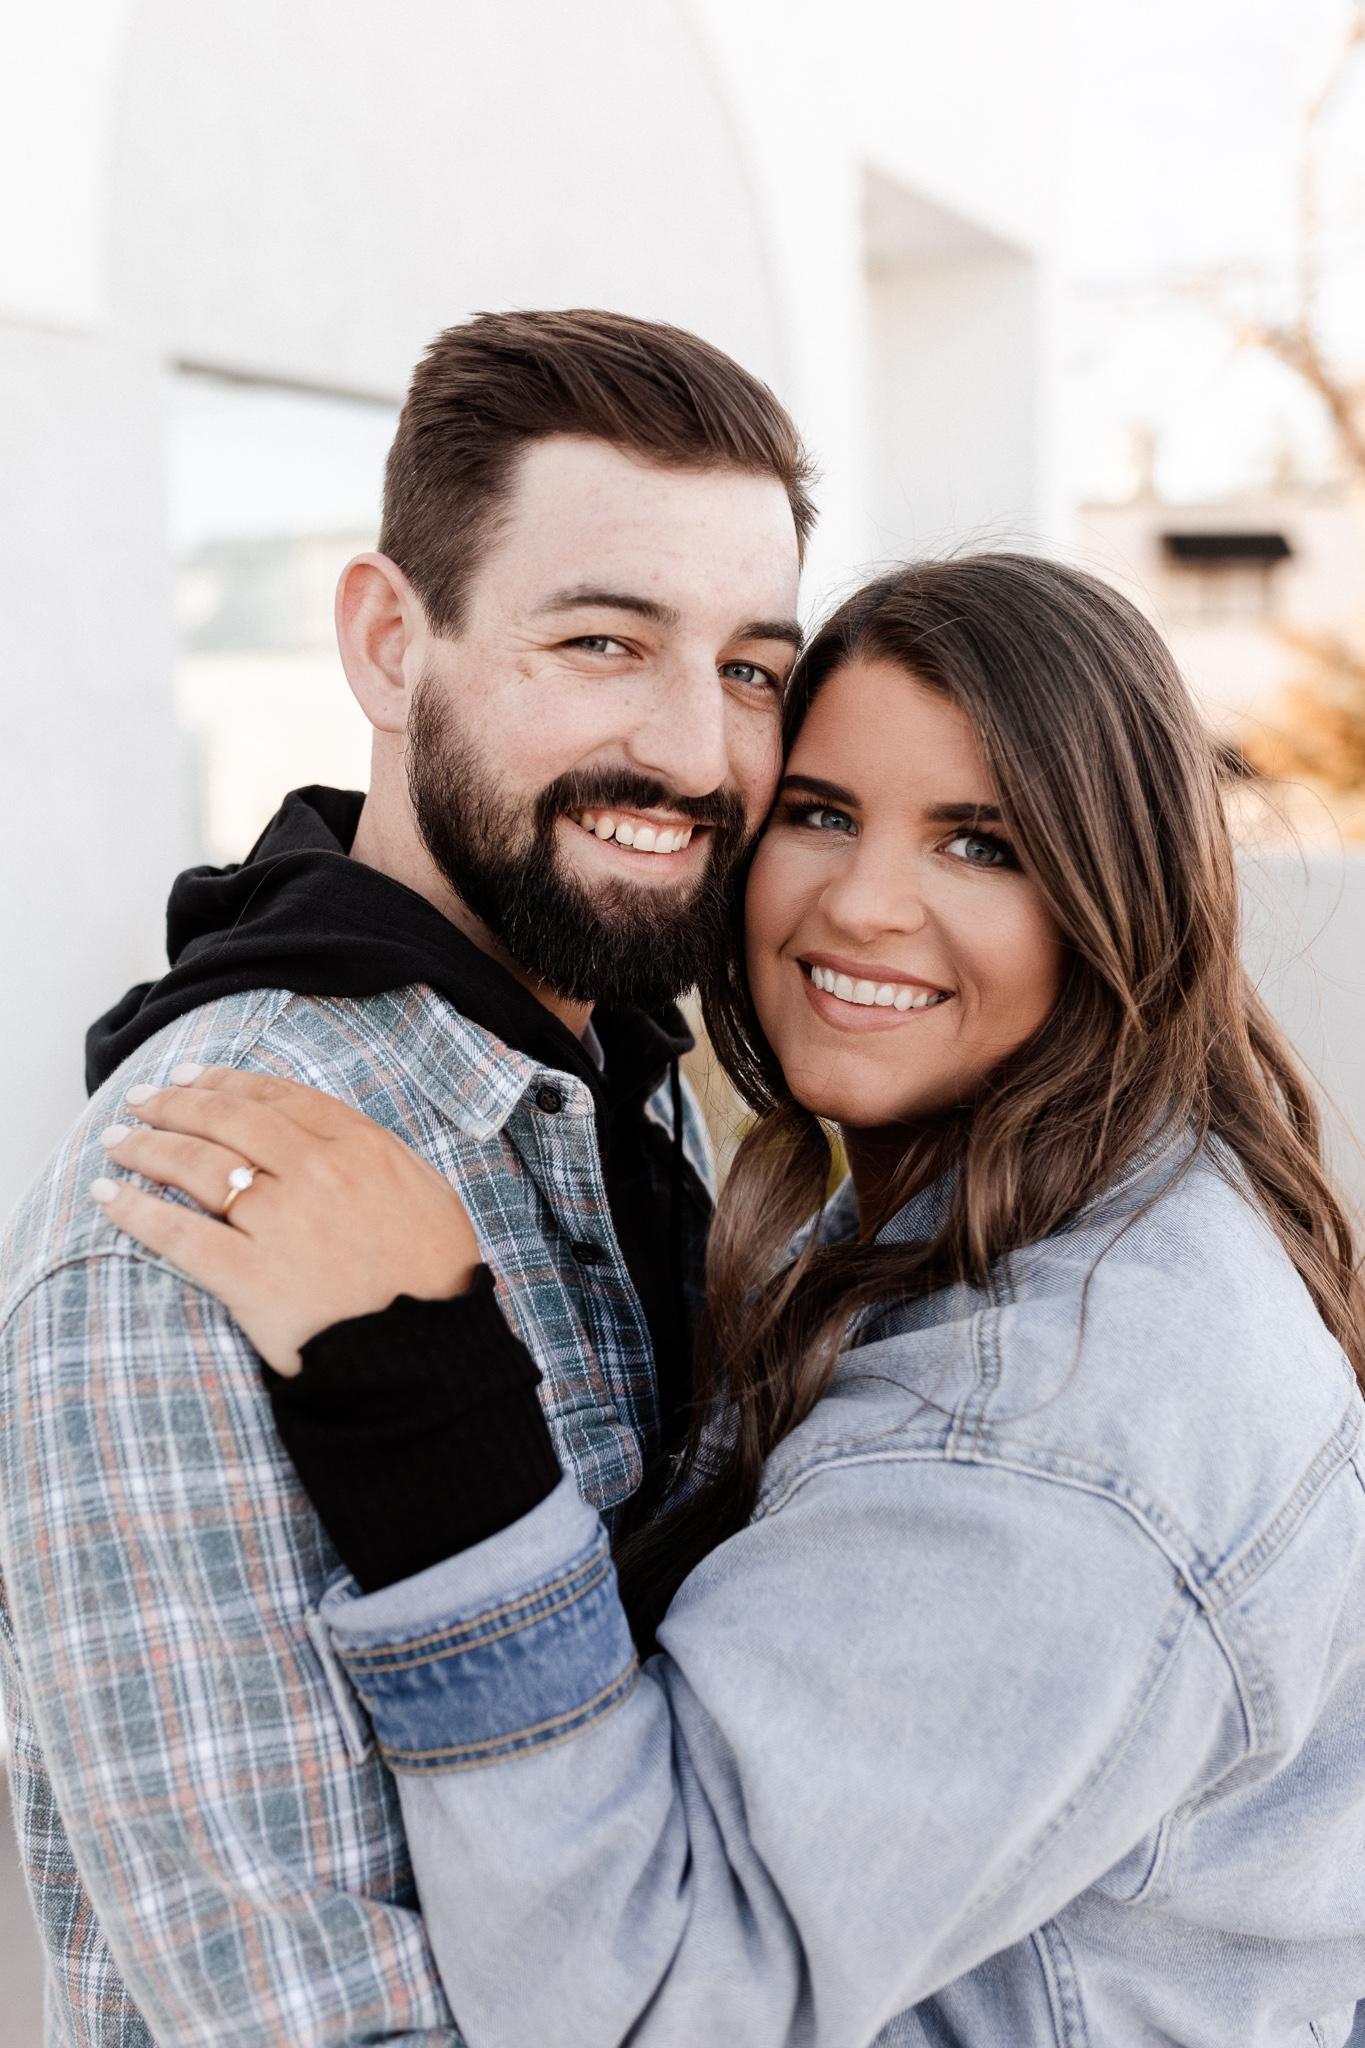 John + Anna | Modern Minimal Engagement Photos | Oklahoma Wedding Photographer-8.jpg